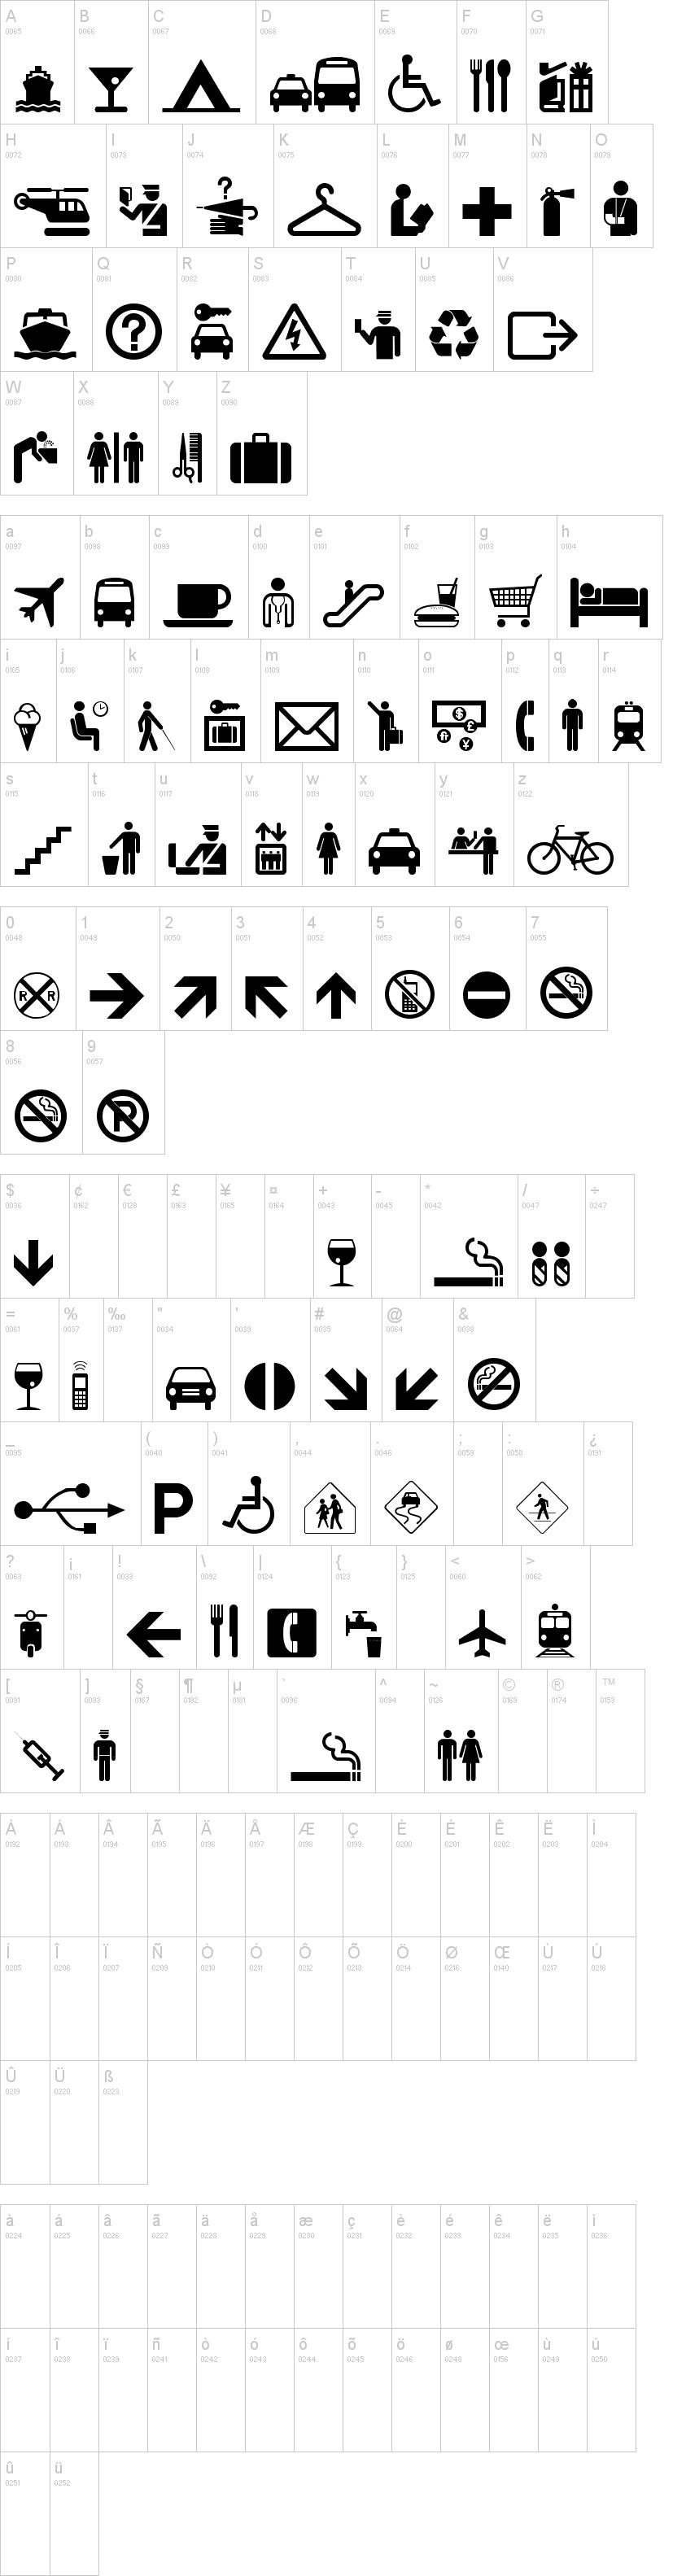 Travelcons Font Dafont